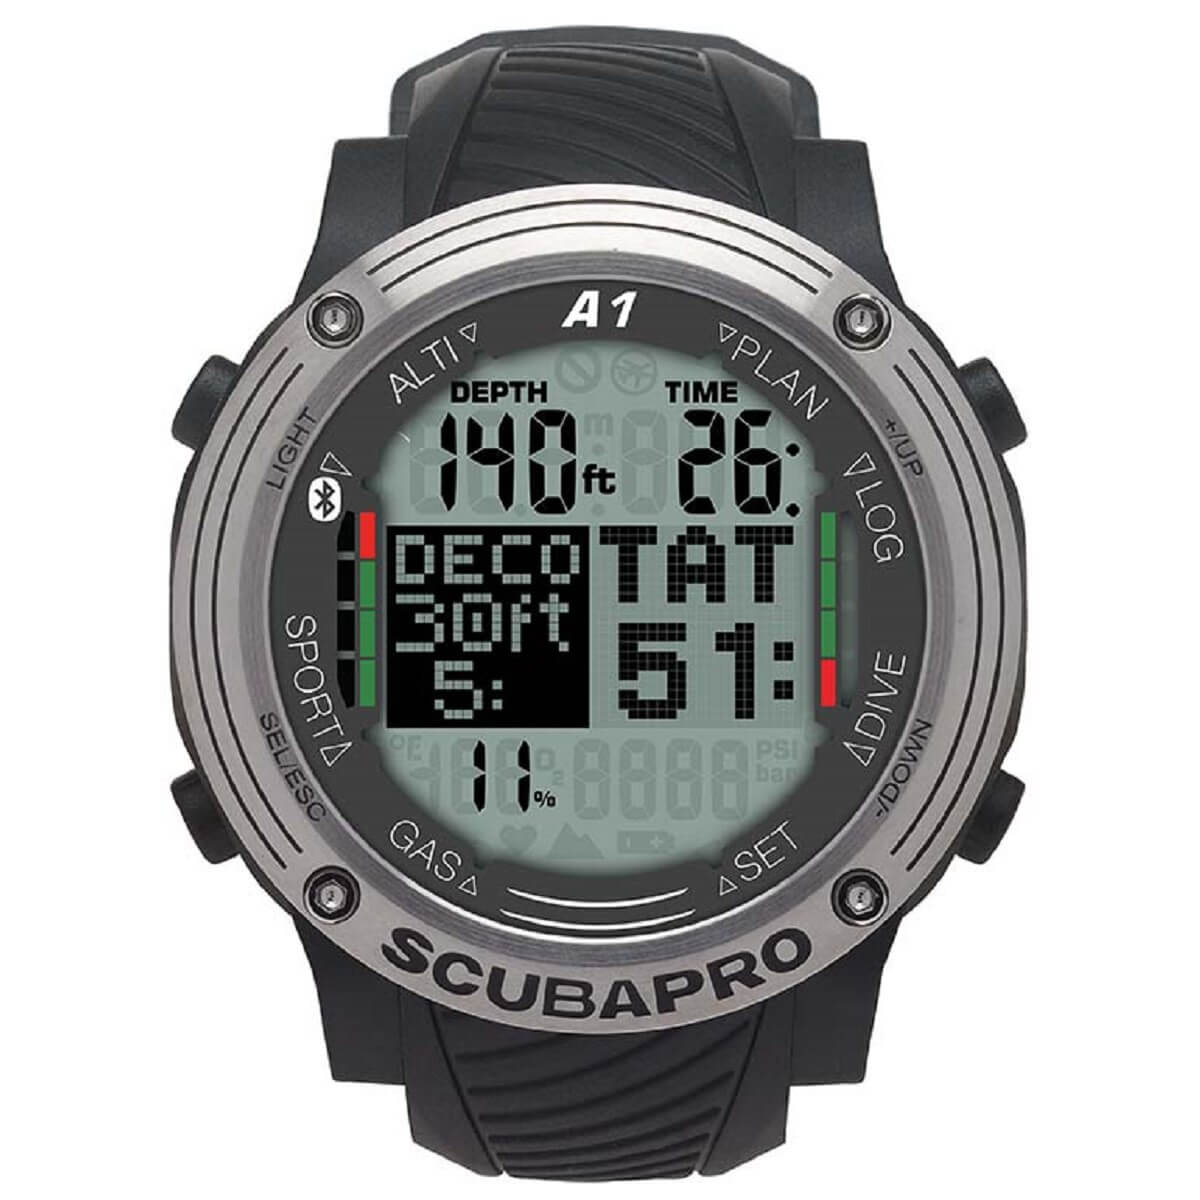 Aladin A1 Uhrencomputer